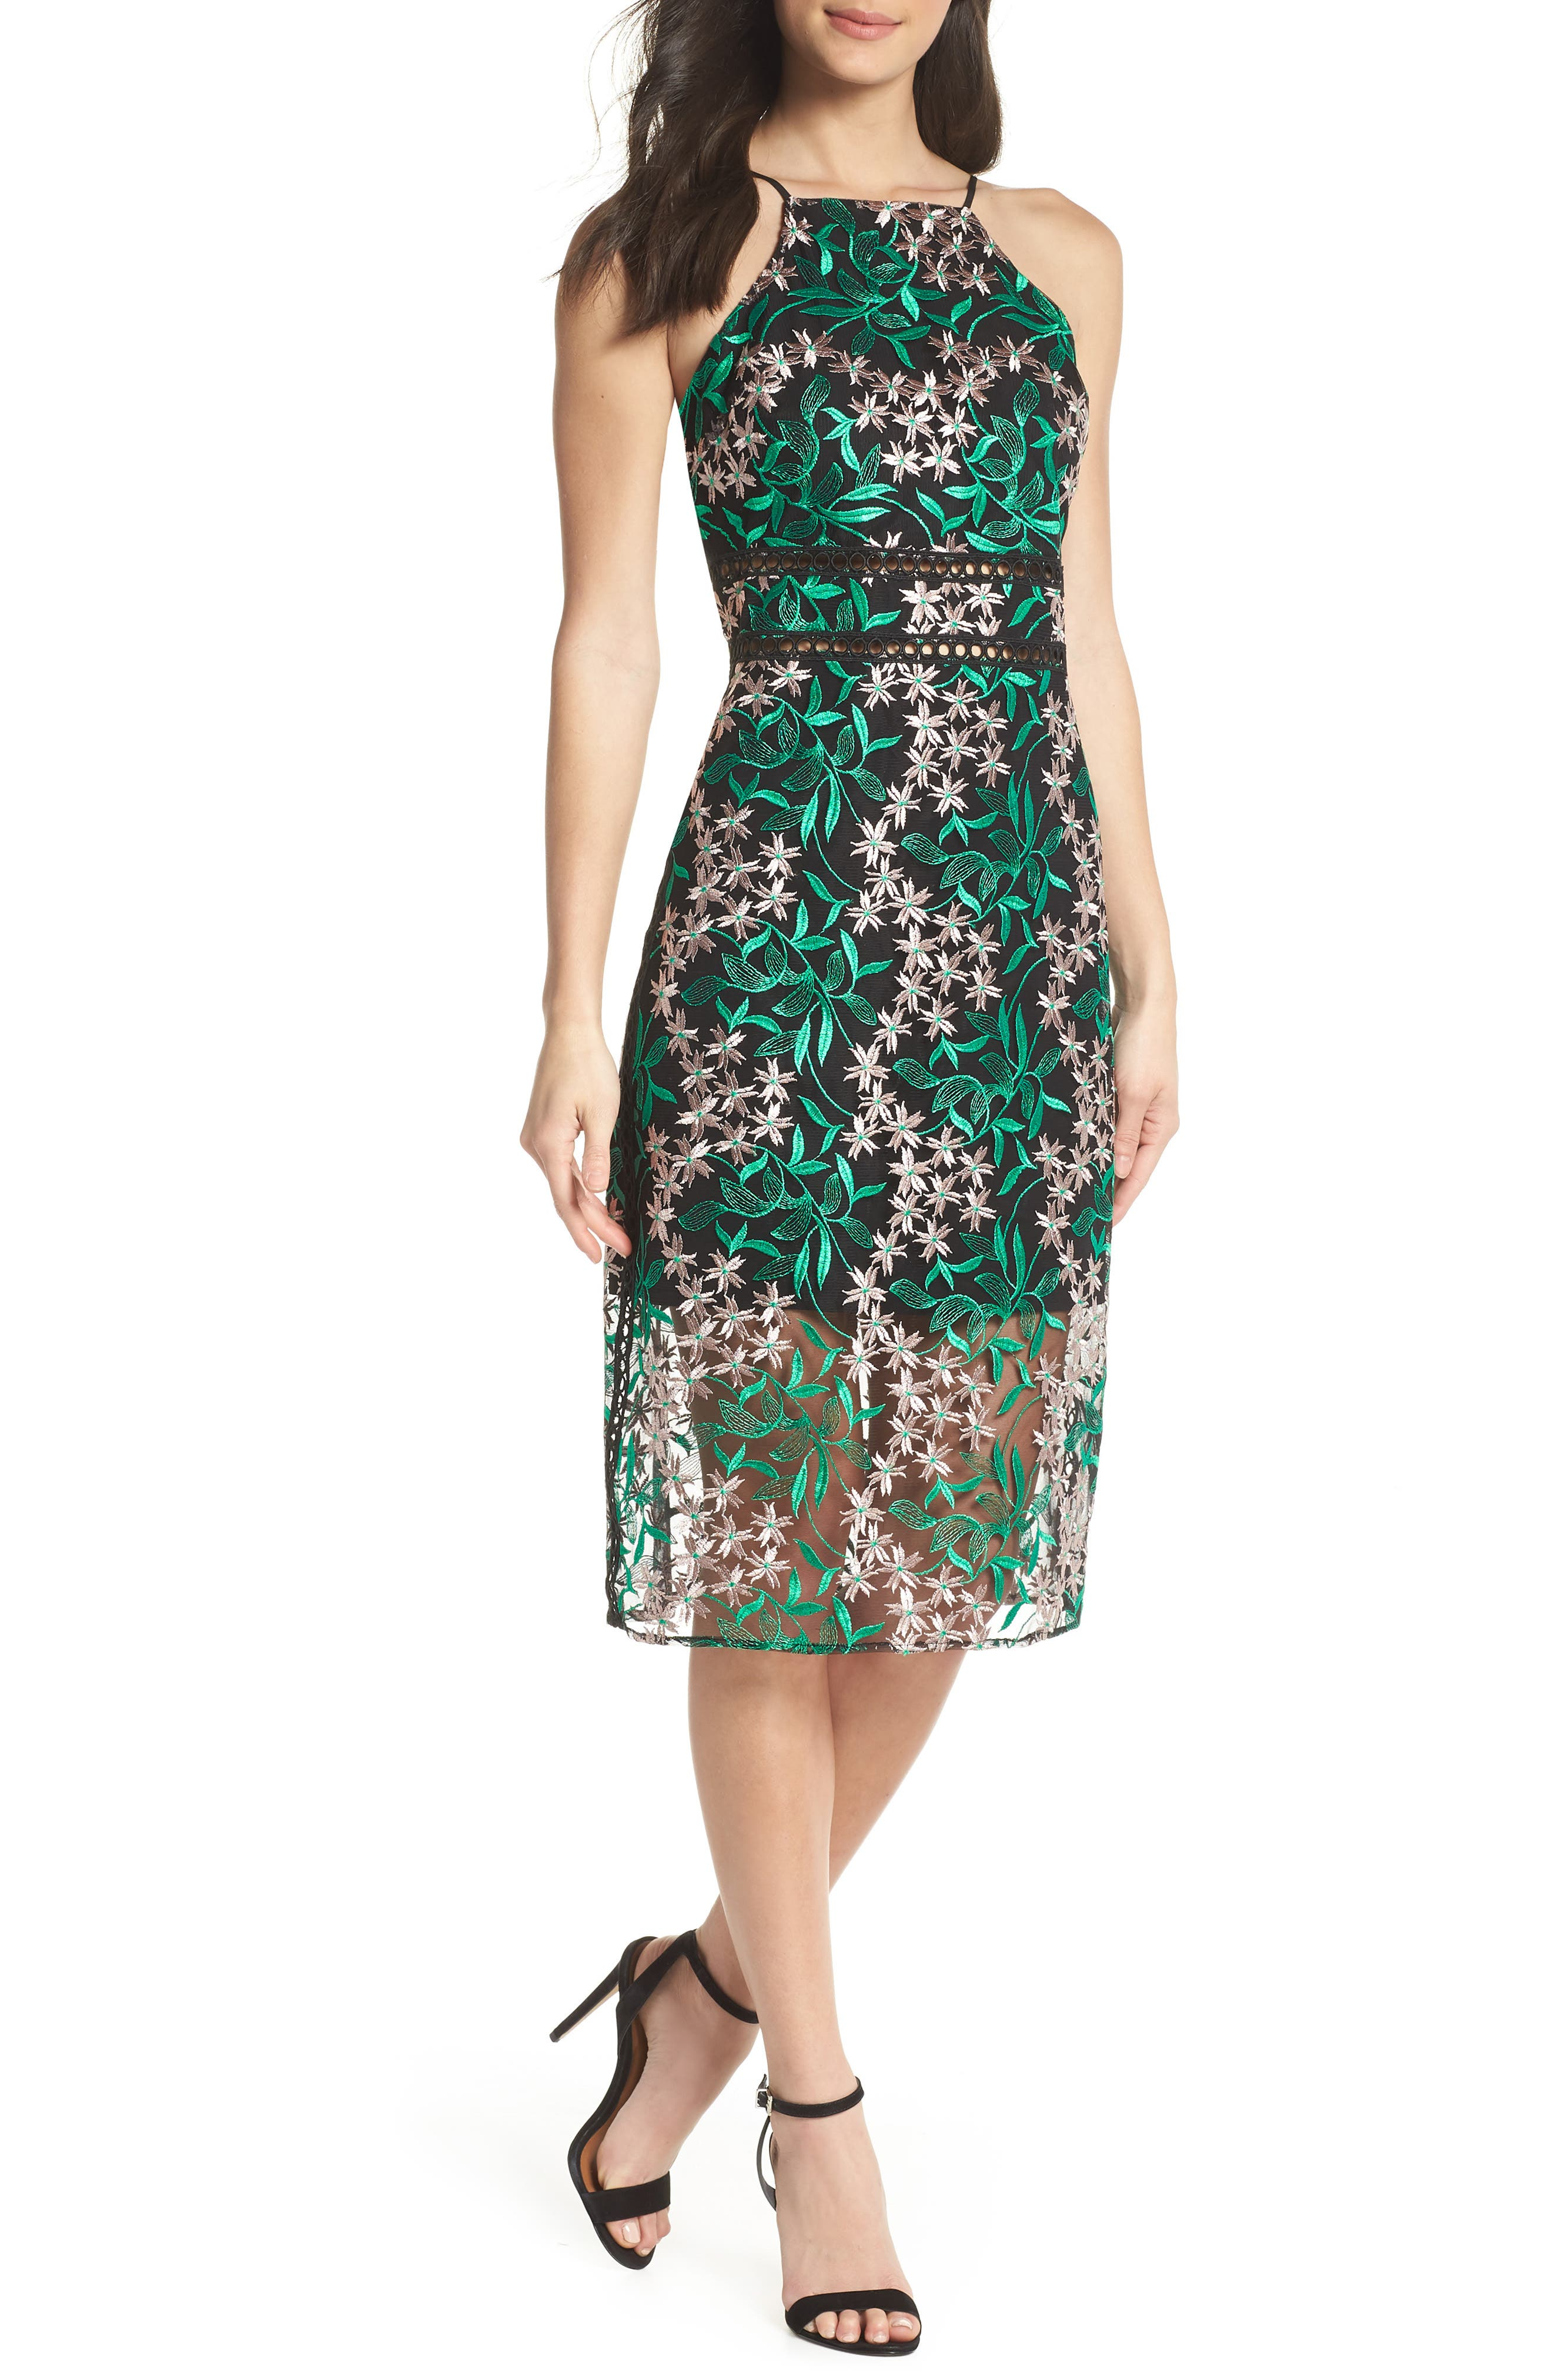 Main Image - Sam Edelman Embroidered Lace Pencil Dress